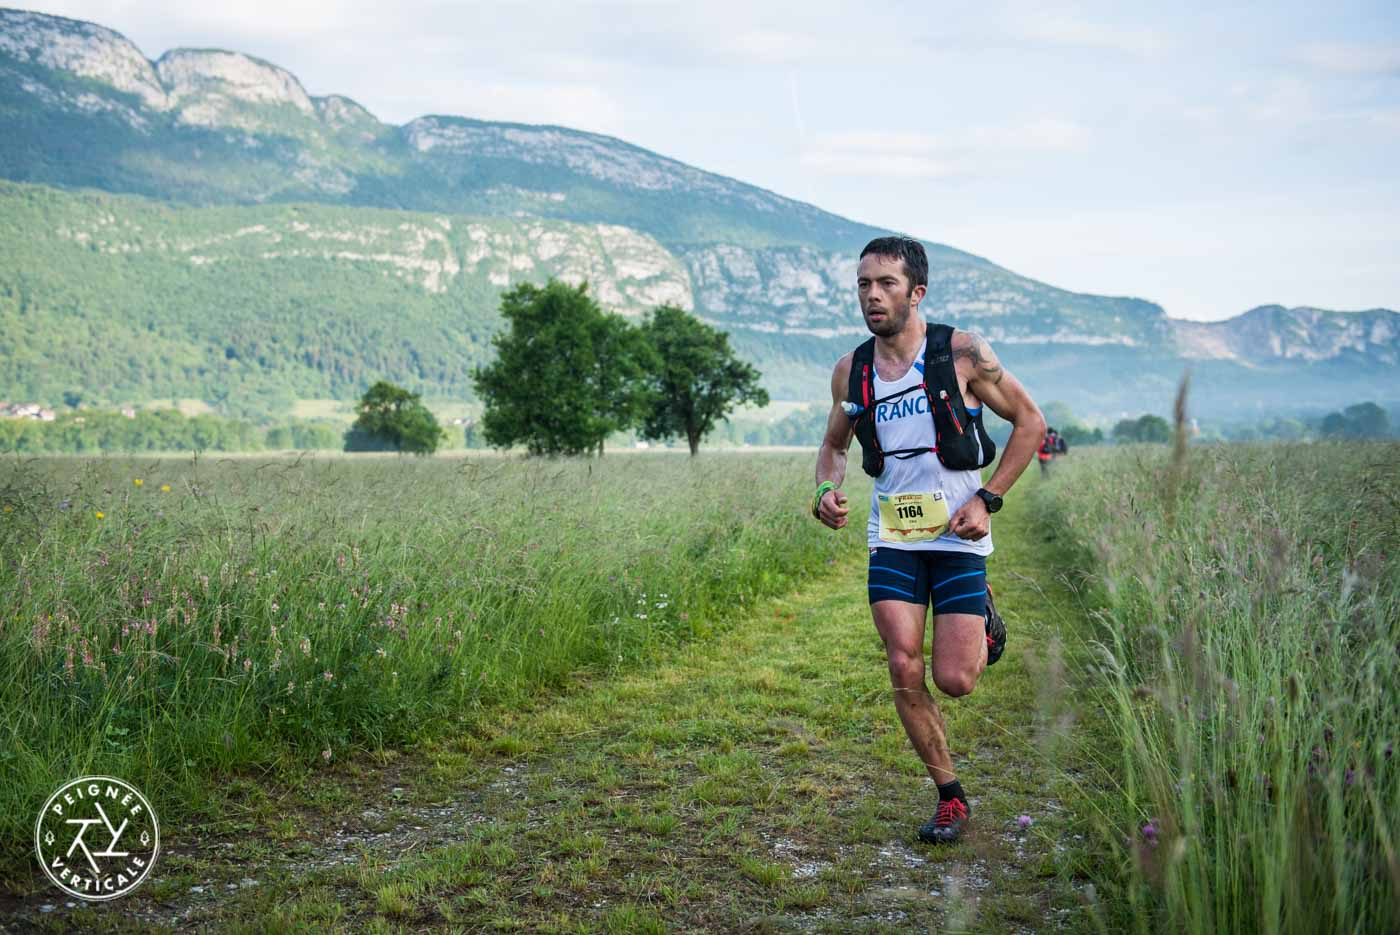 Clients-Maxi-Race-2015-Timothee-Nalet-Photographe-5924.jpg